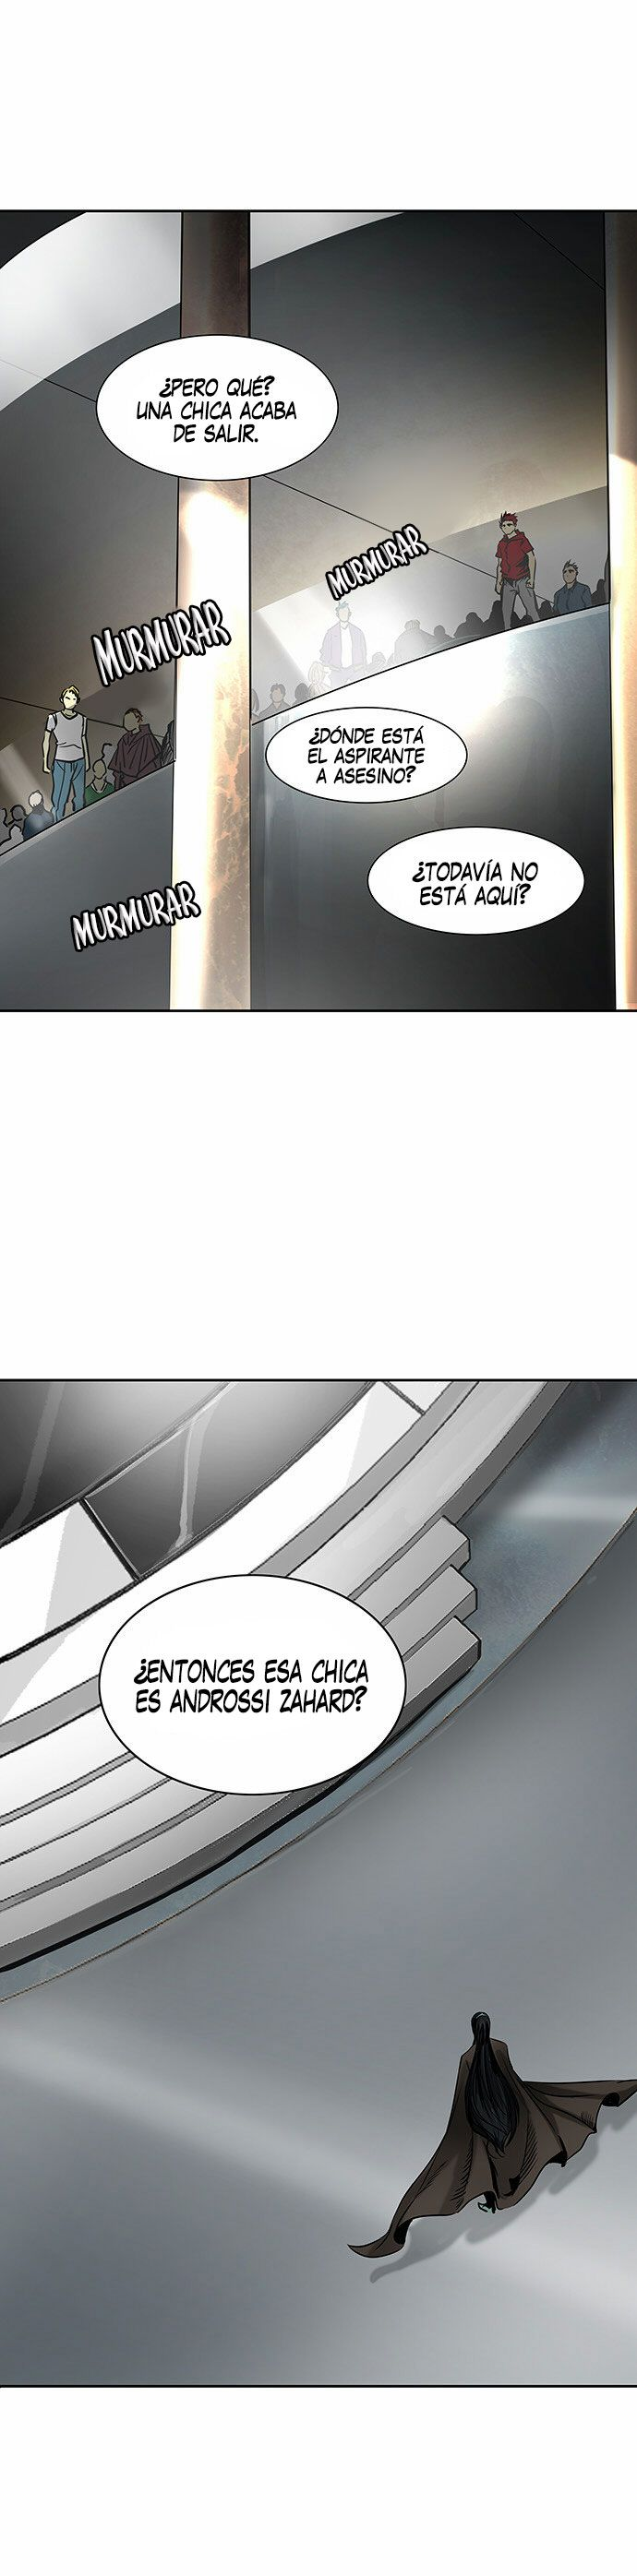 http://c5.ninemanga.com/es_manga/pic2/21/149/513715/5713d94b932fda2d38d15466f4d5d7a1.jpg Page 2